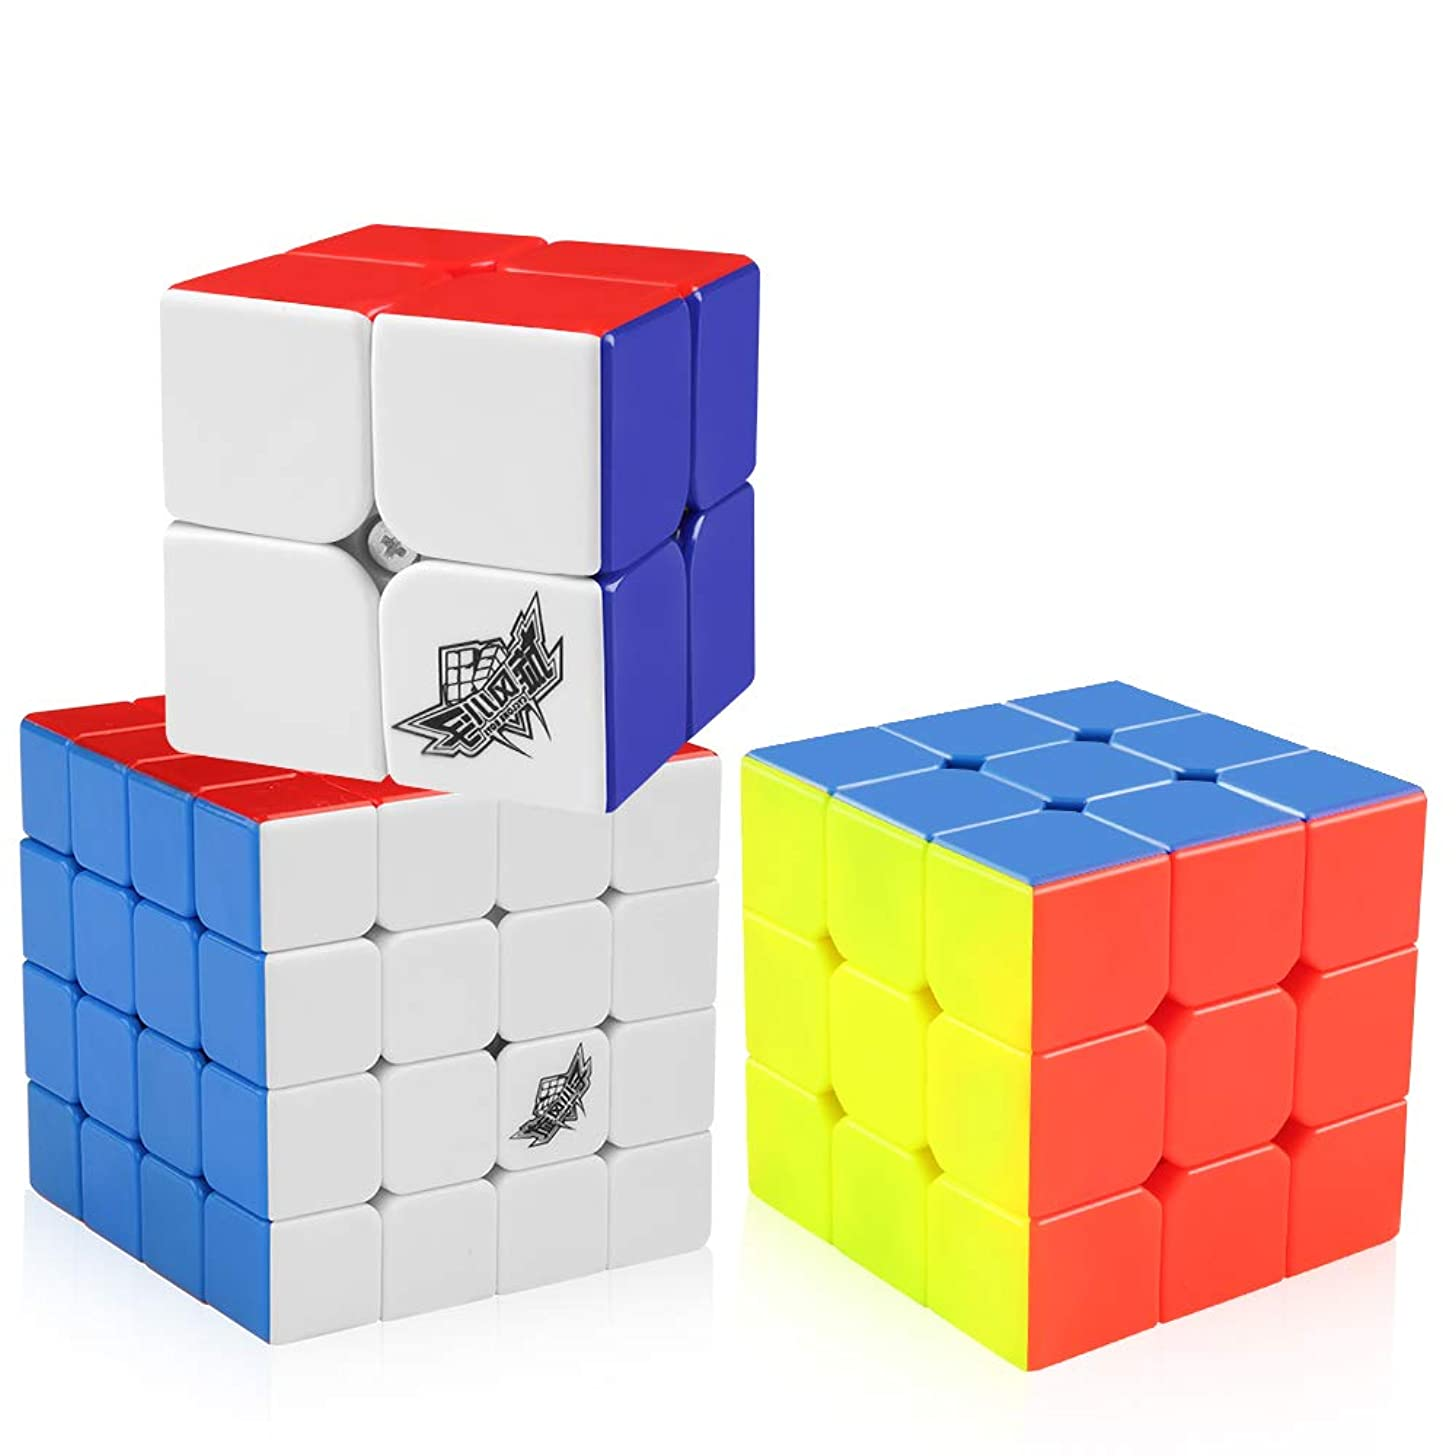 D-FantiX Cyclone Boys 2x2 3x3 4x4 Speed Cube Set, Stickerless Magic Cube Puzzles Toy Pack of 3